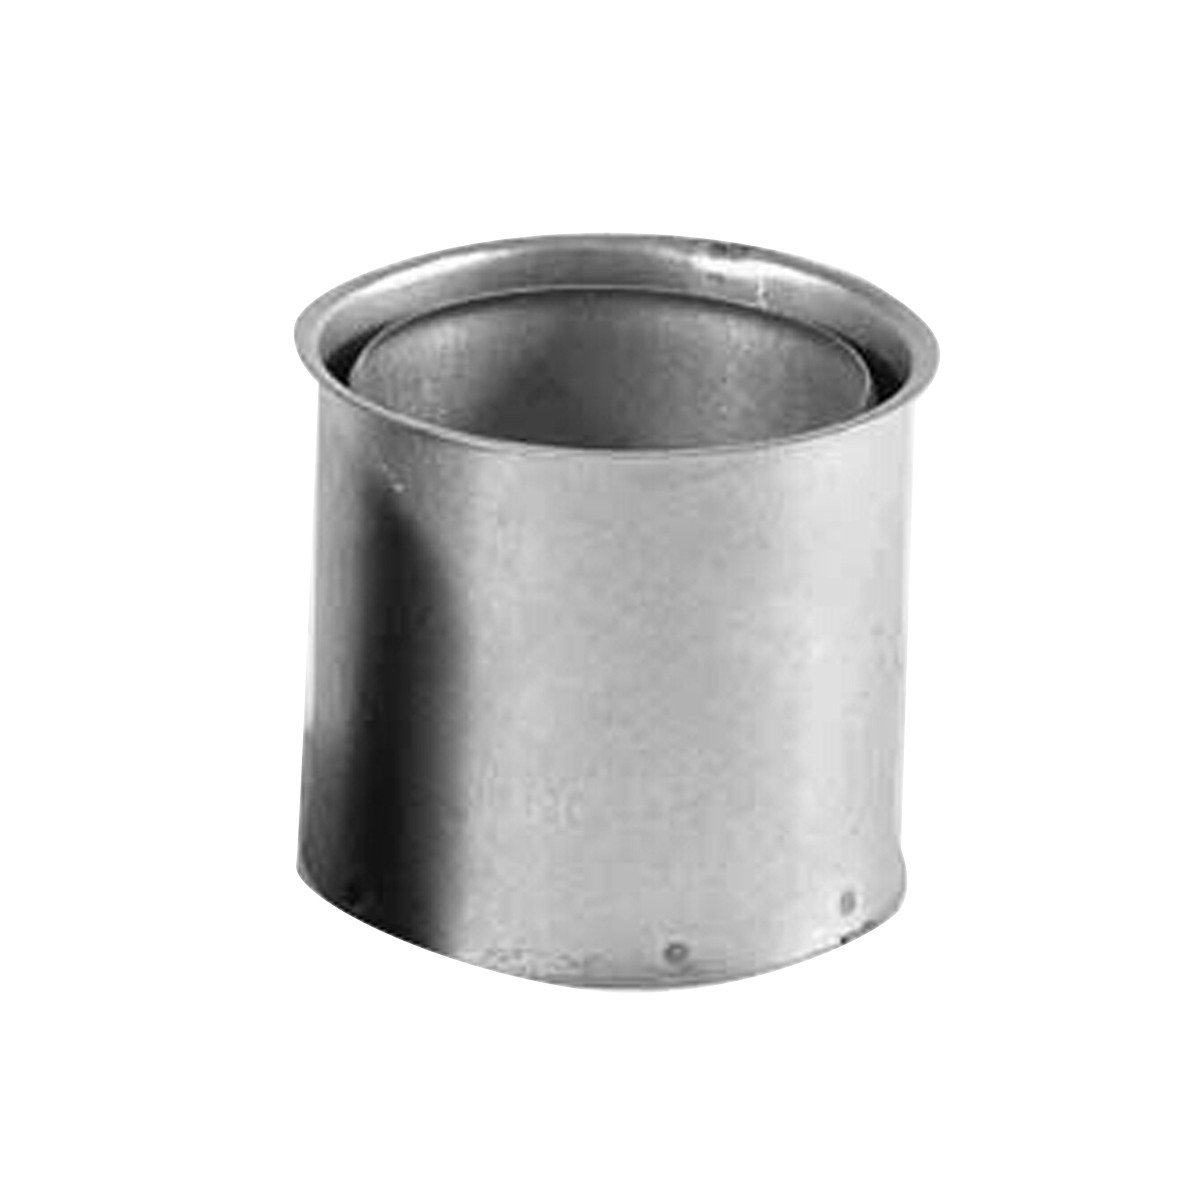 Kamino - Flam - Tubo para chimenea, Doble pared forro para estufa de leña, Conducto de humos, Tubo doble pared - acero resistente a altas temperaturas ...